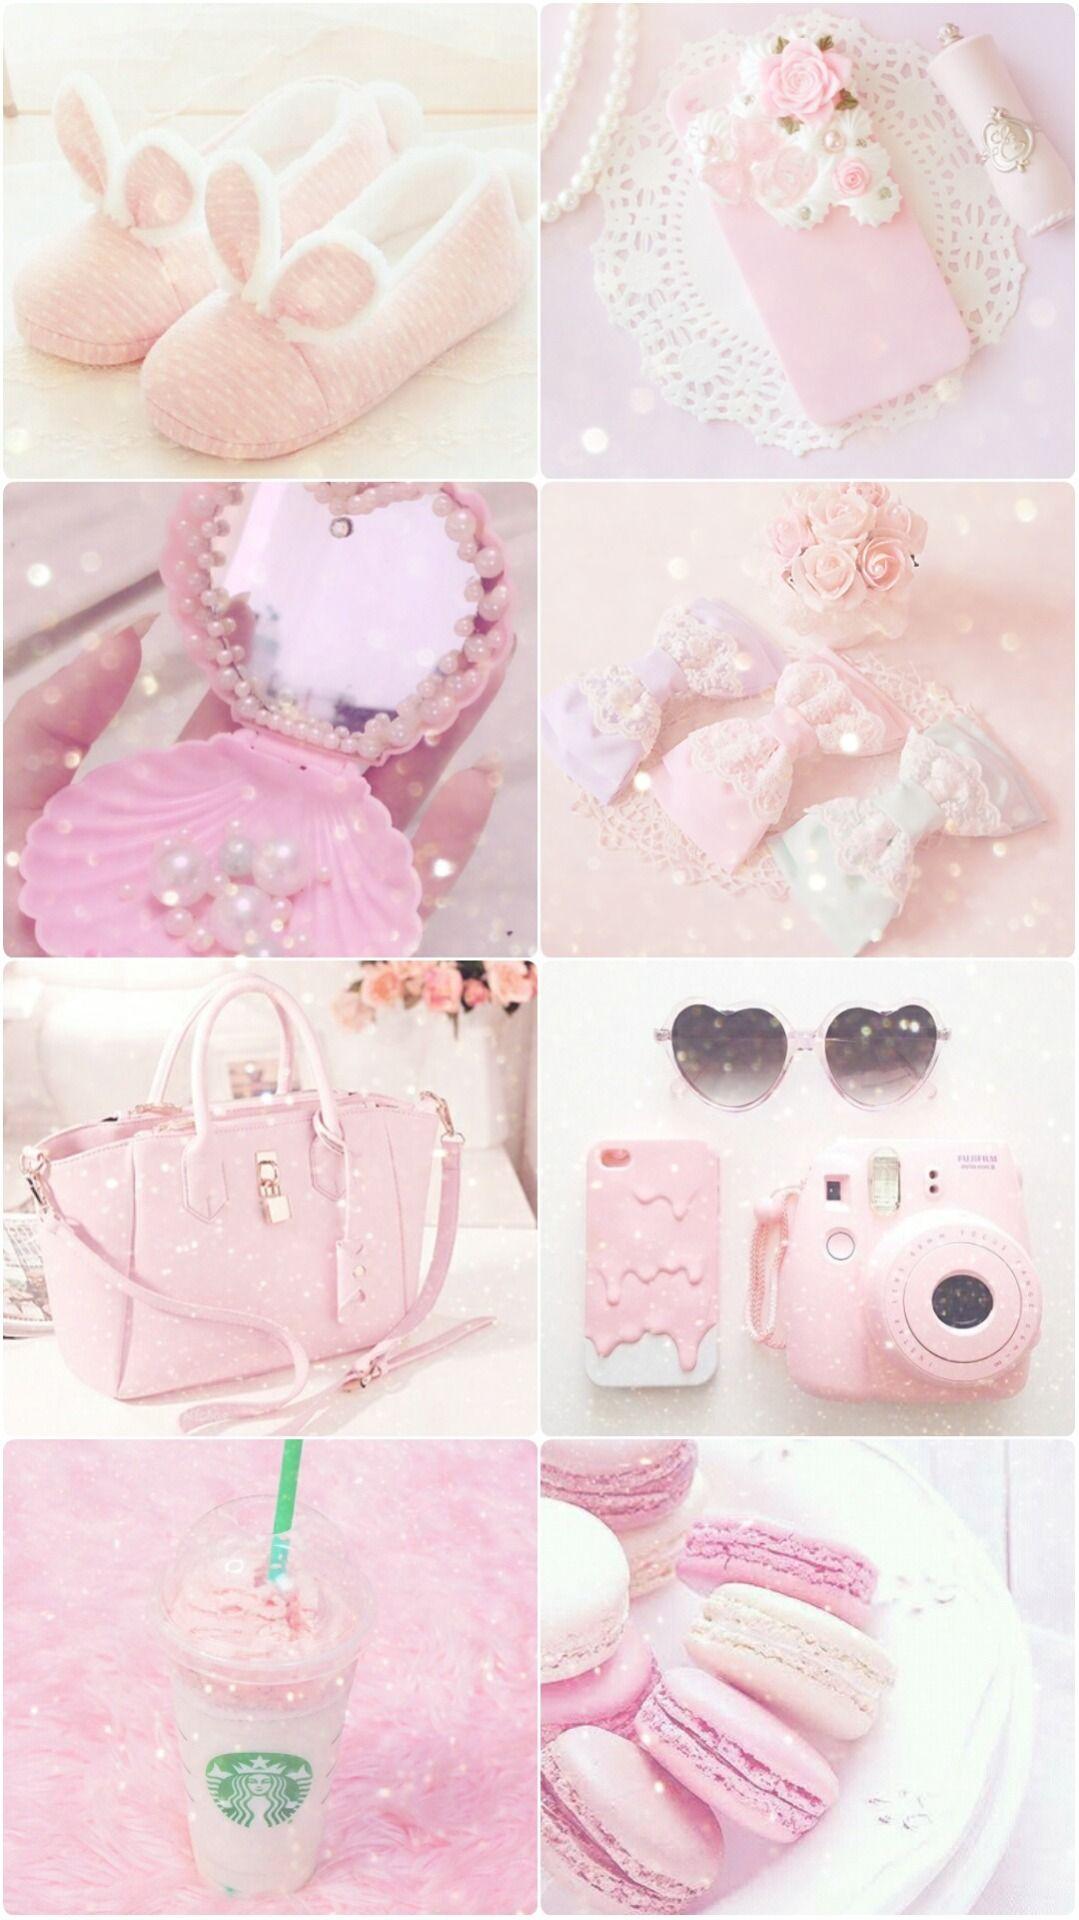 Pink Life Always : Photo   Pink girly things, Pink life, Pink wallpaper